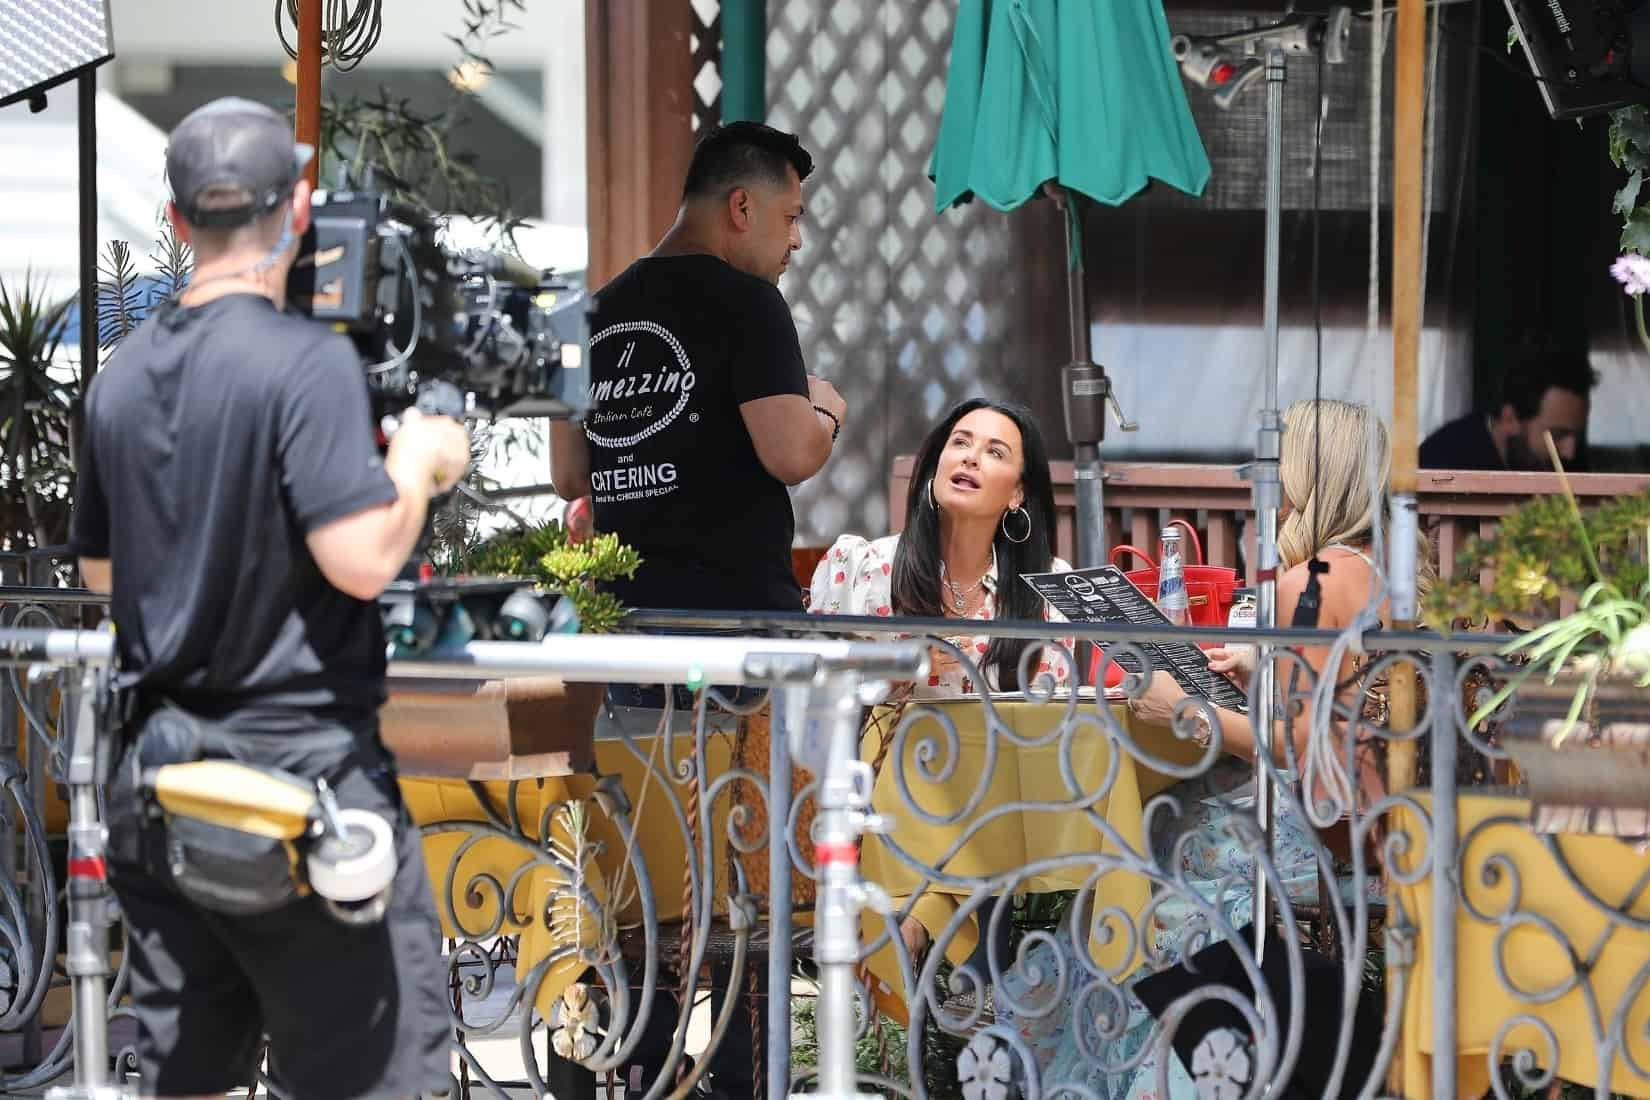 Kyle Richards and Teddi Mellencamp Film RHOBH Season 10 in Studio City